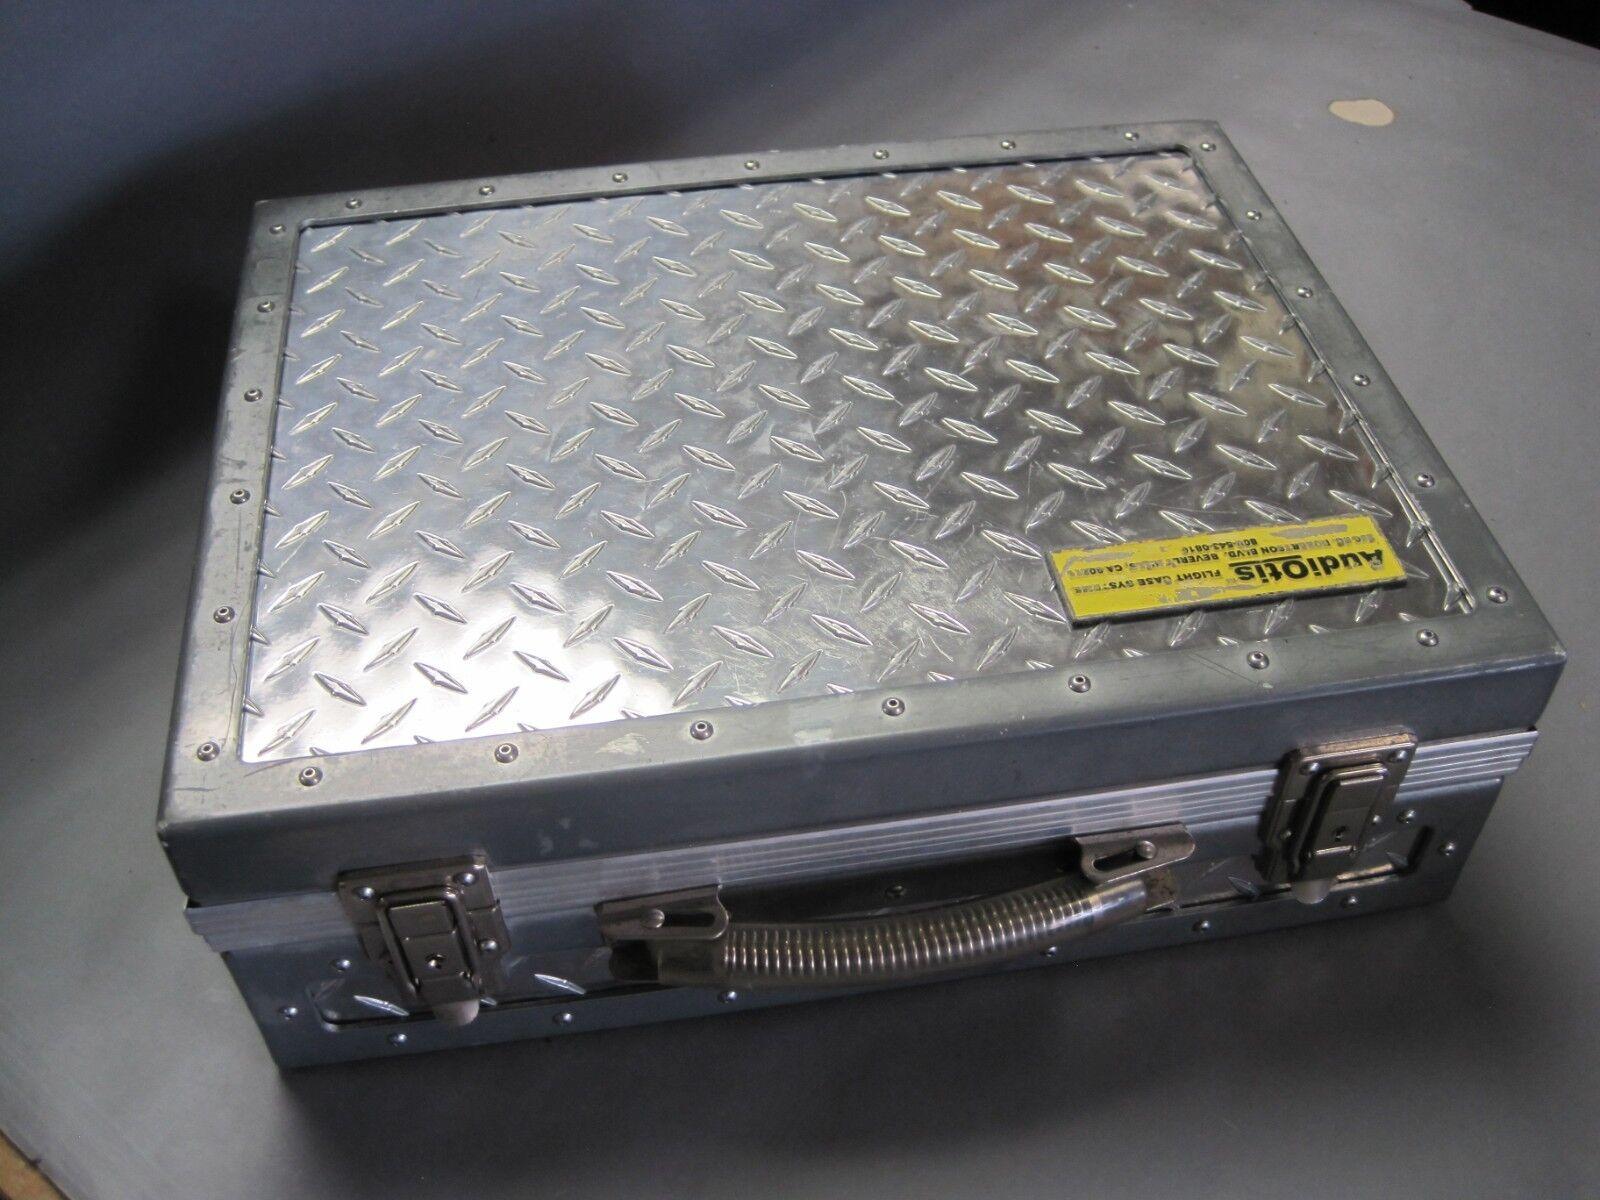 AudiOtis Flight Case Systems Carrying Case Large Attache Style Foam Inside Audio